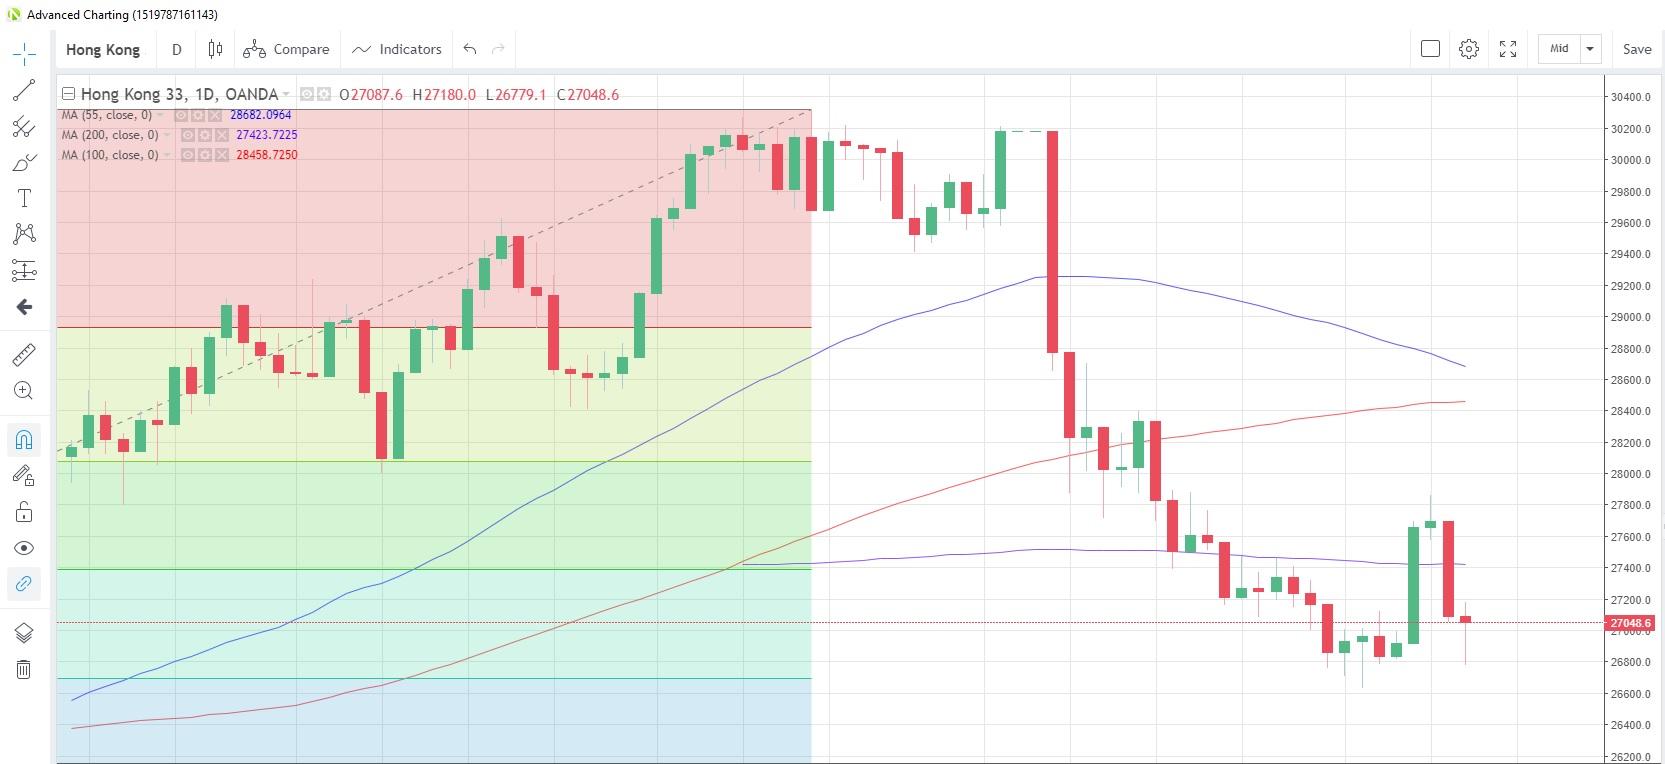 HK33HKD Daily Chart